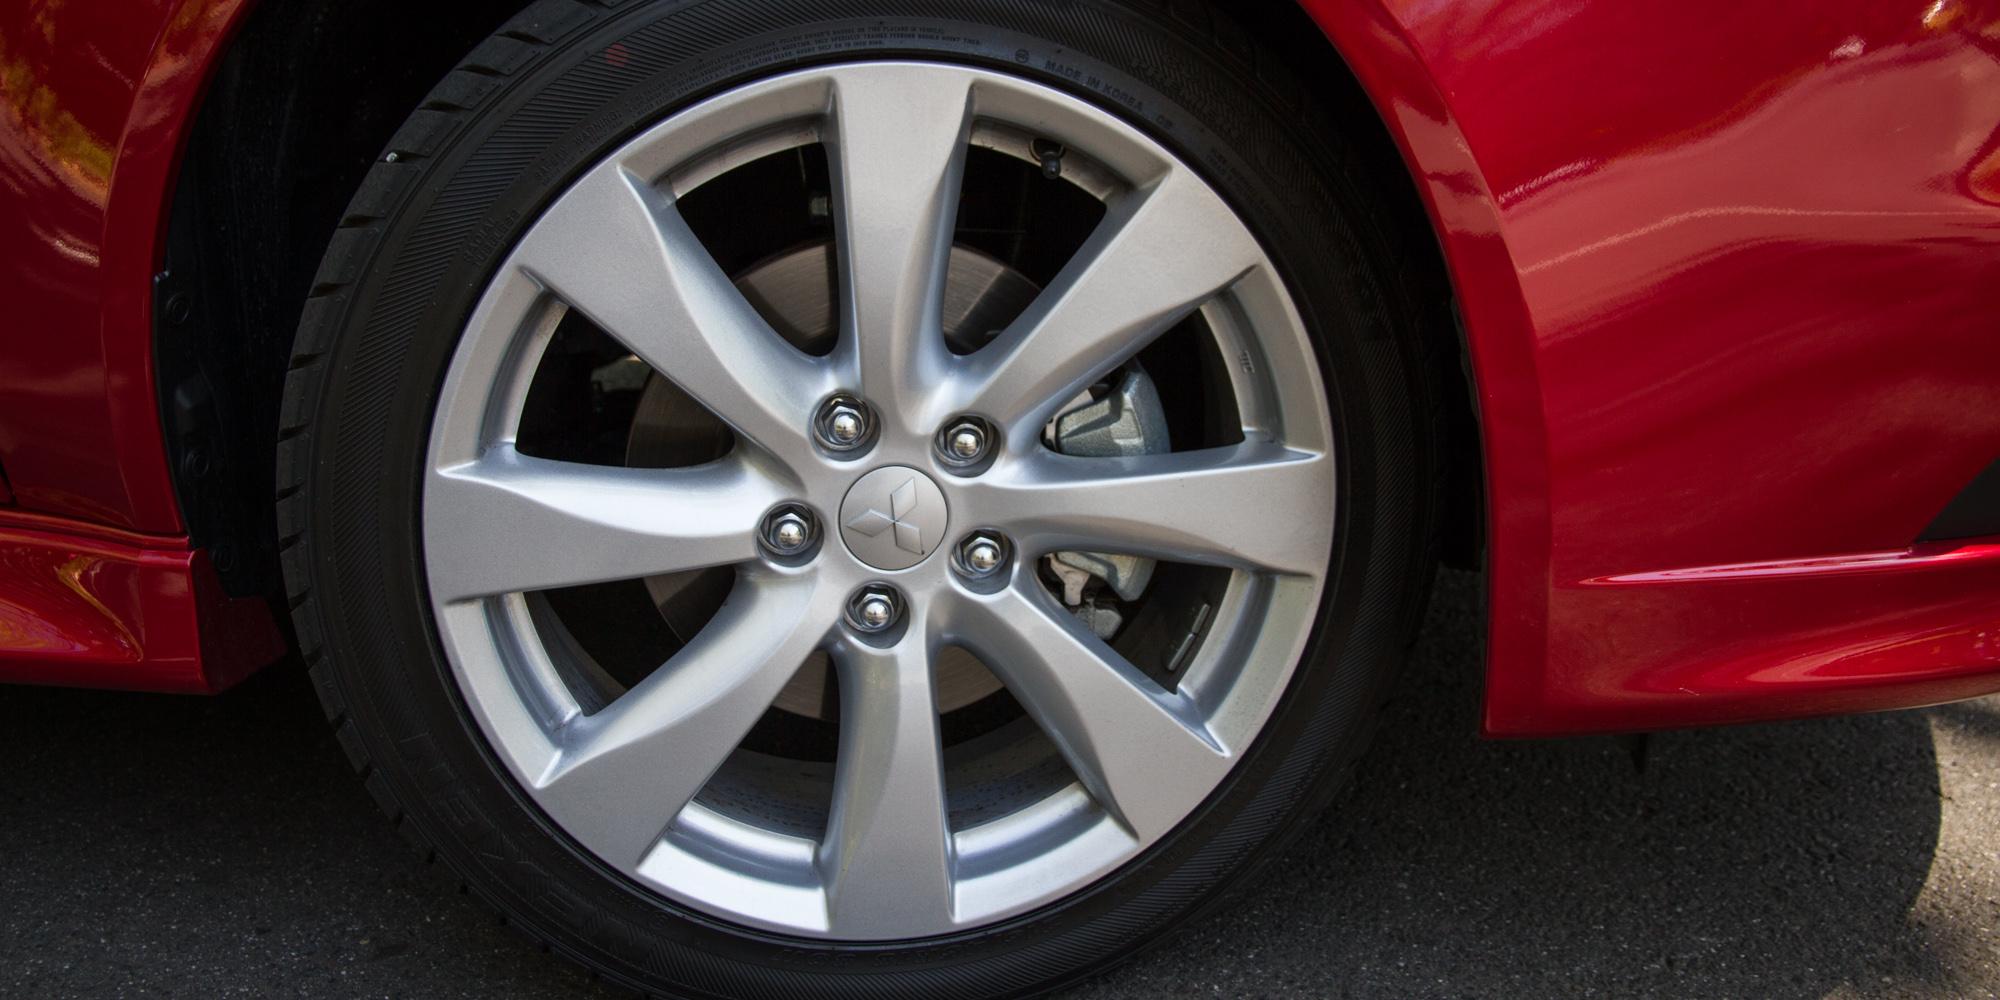 2015 Mitsubishi Lancer Sportback GSR Review | CarAdvice